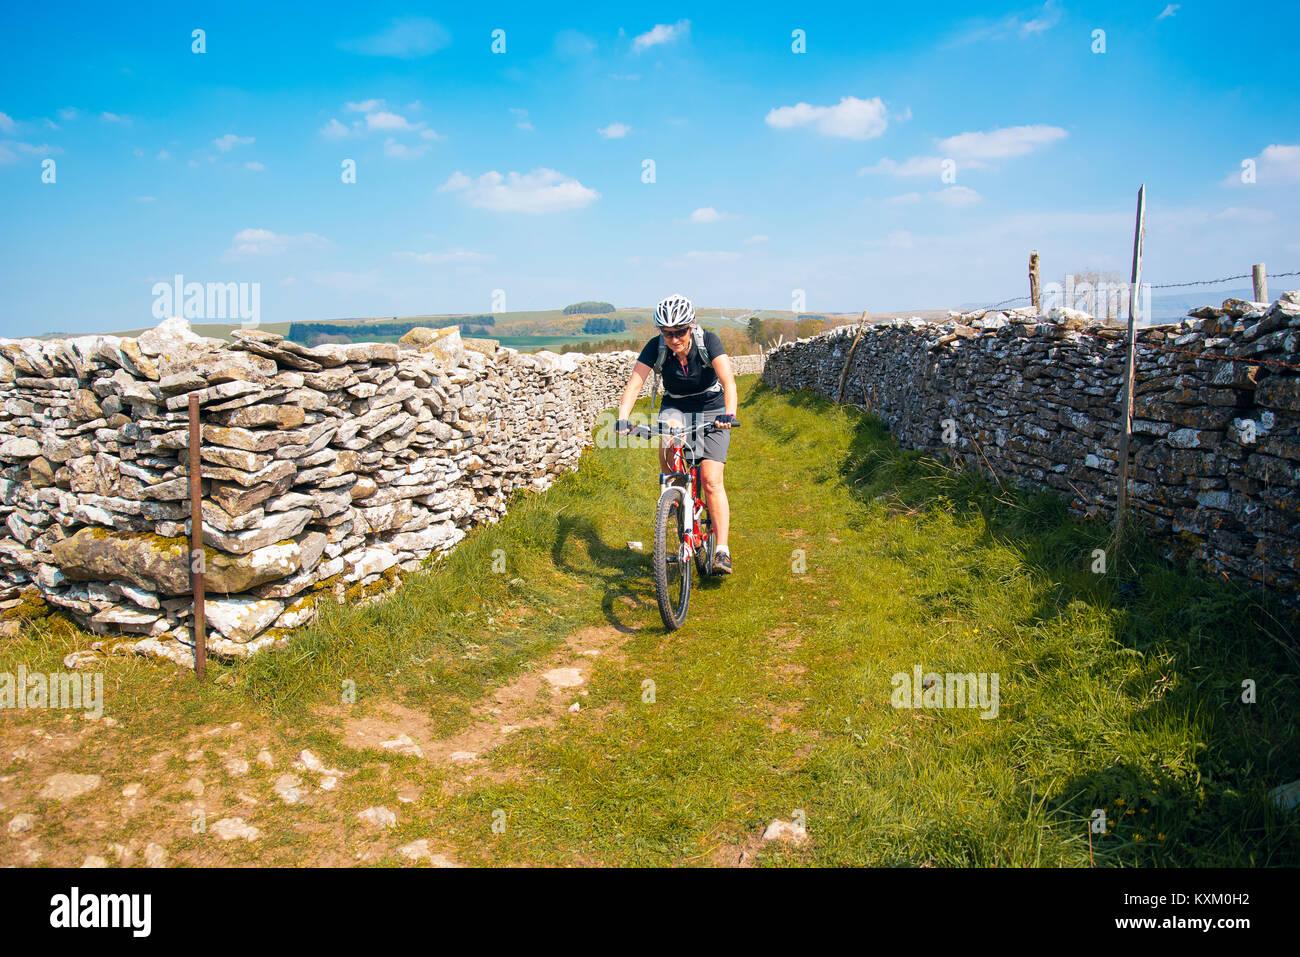 Female mountain biker on easy trail near Newbiggin-on-Lune, Cumbria - Stock Image